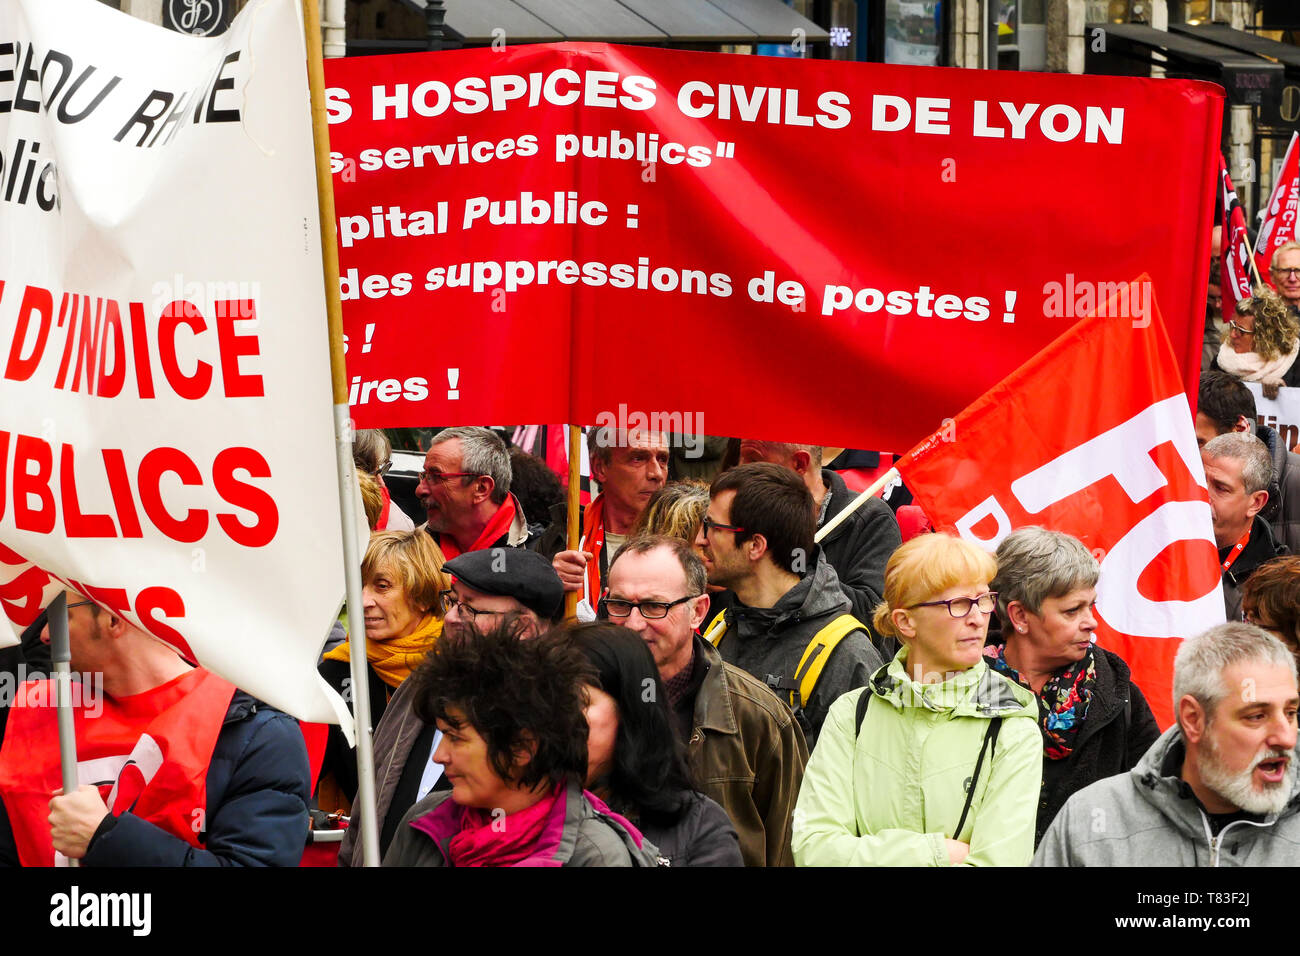 Public officials march to defend civil Services, Lyon, France Stock Photo